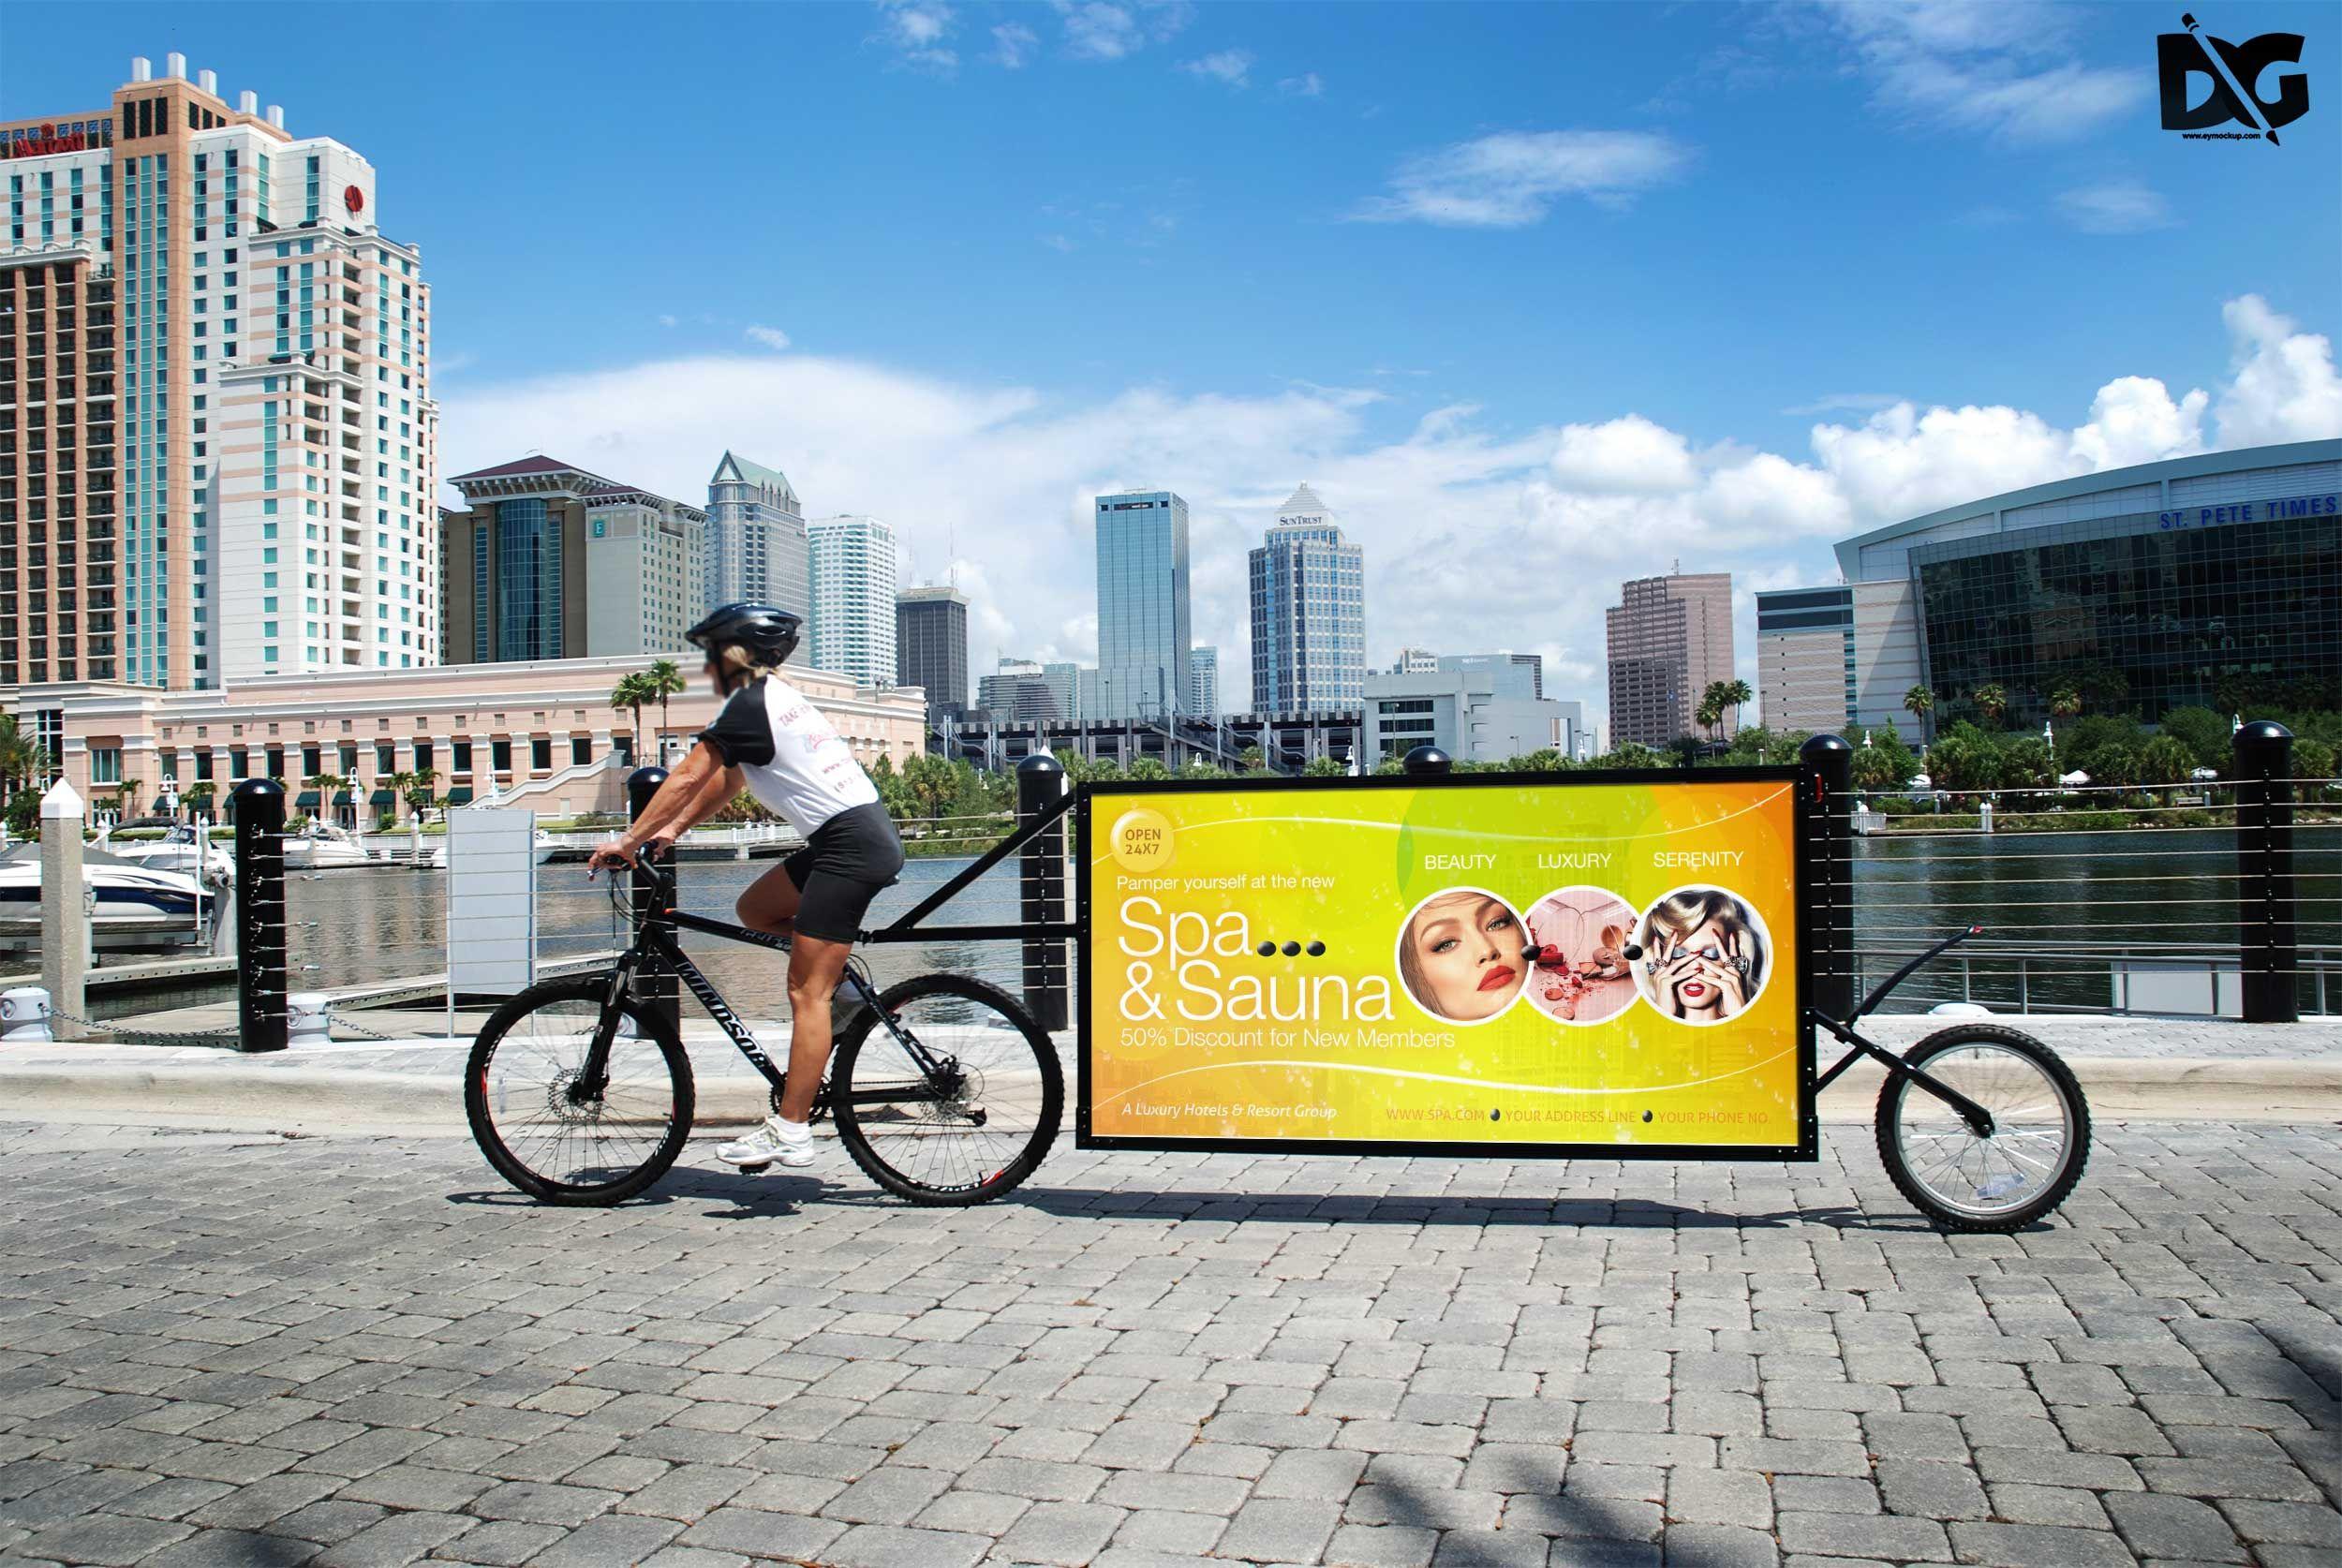 Download Free Mock Up Bicycle Billboard Bicycle Branding Download Downloadpsd Free Freemockup Freepsd Freebie Mock Mockup Free Download Mockup Free Psd Mockup